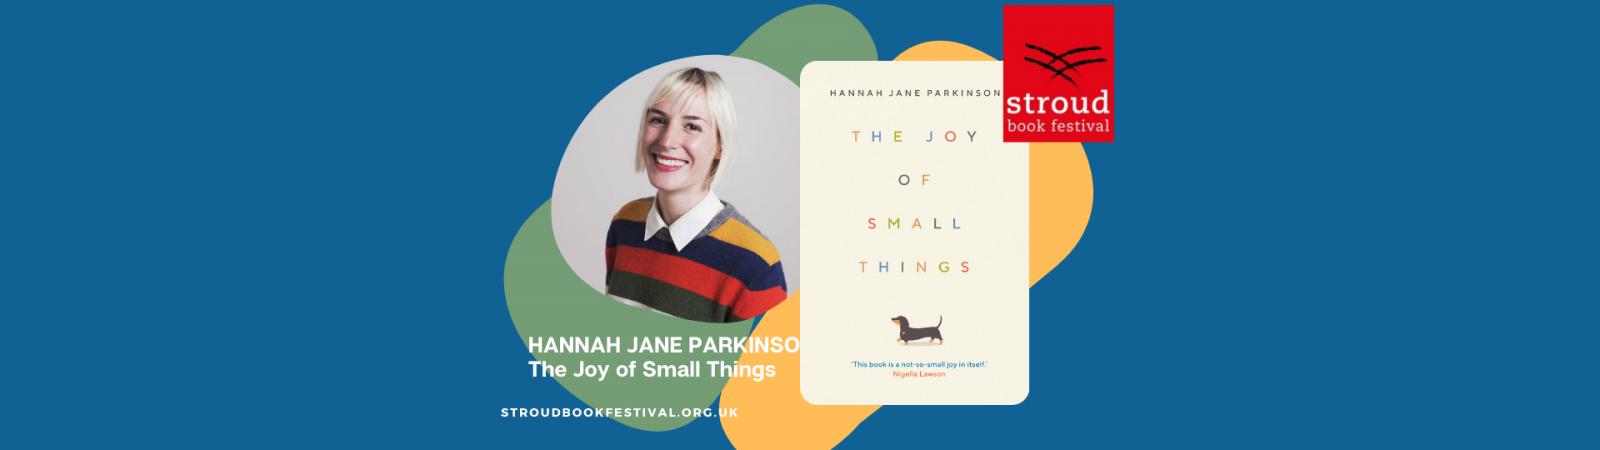 The Joy of Small Things, Hannah Jane Parkinson